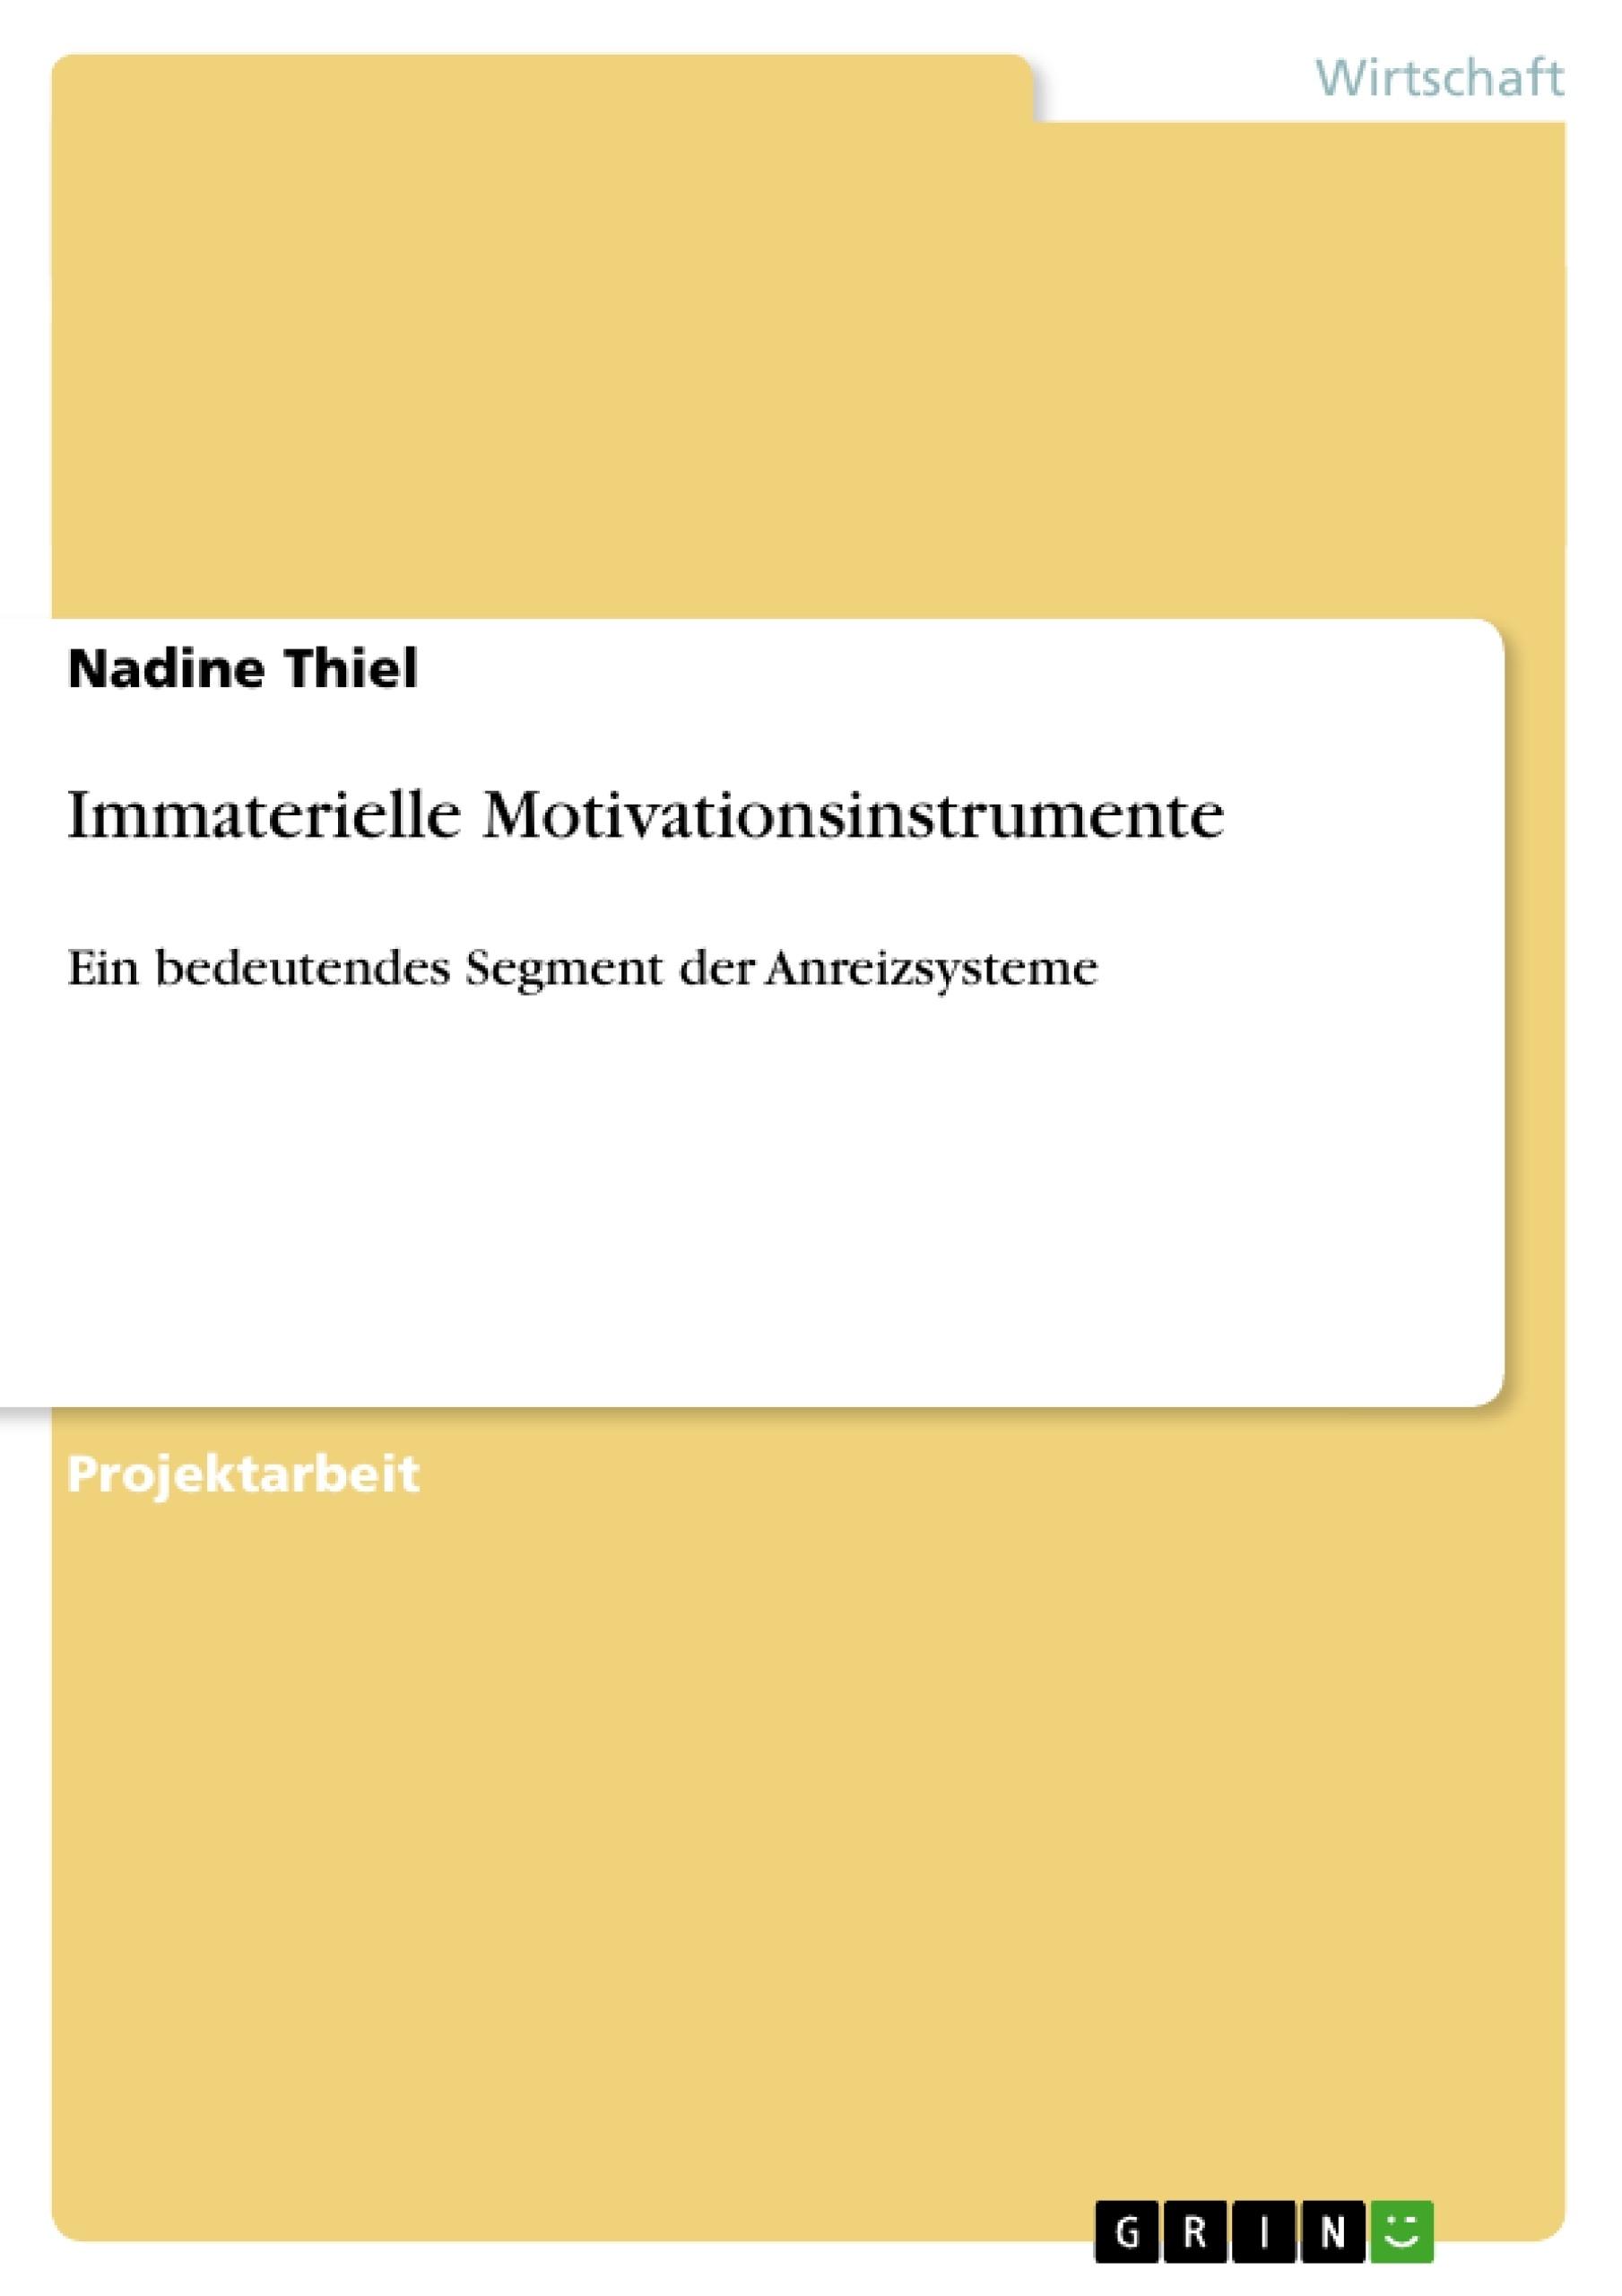 Titel: Immaterielle Motivationsinstrumente